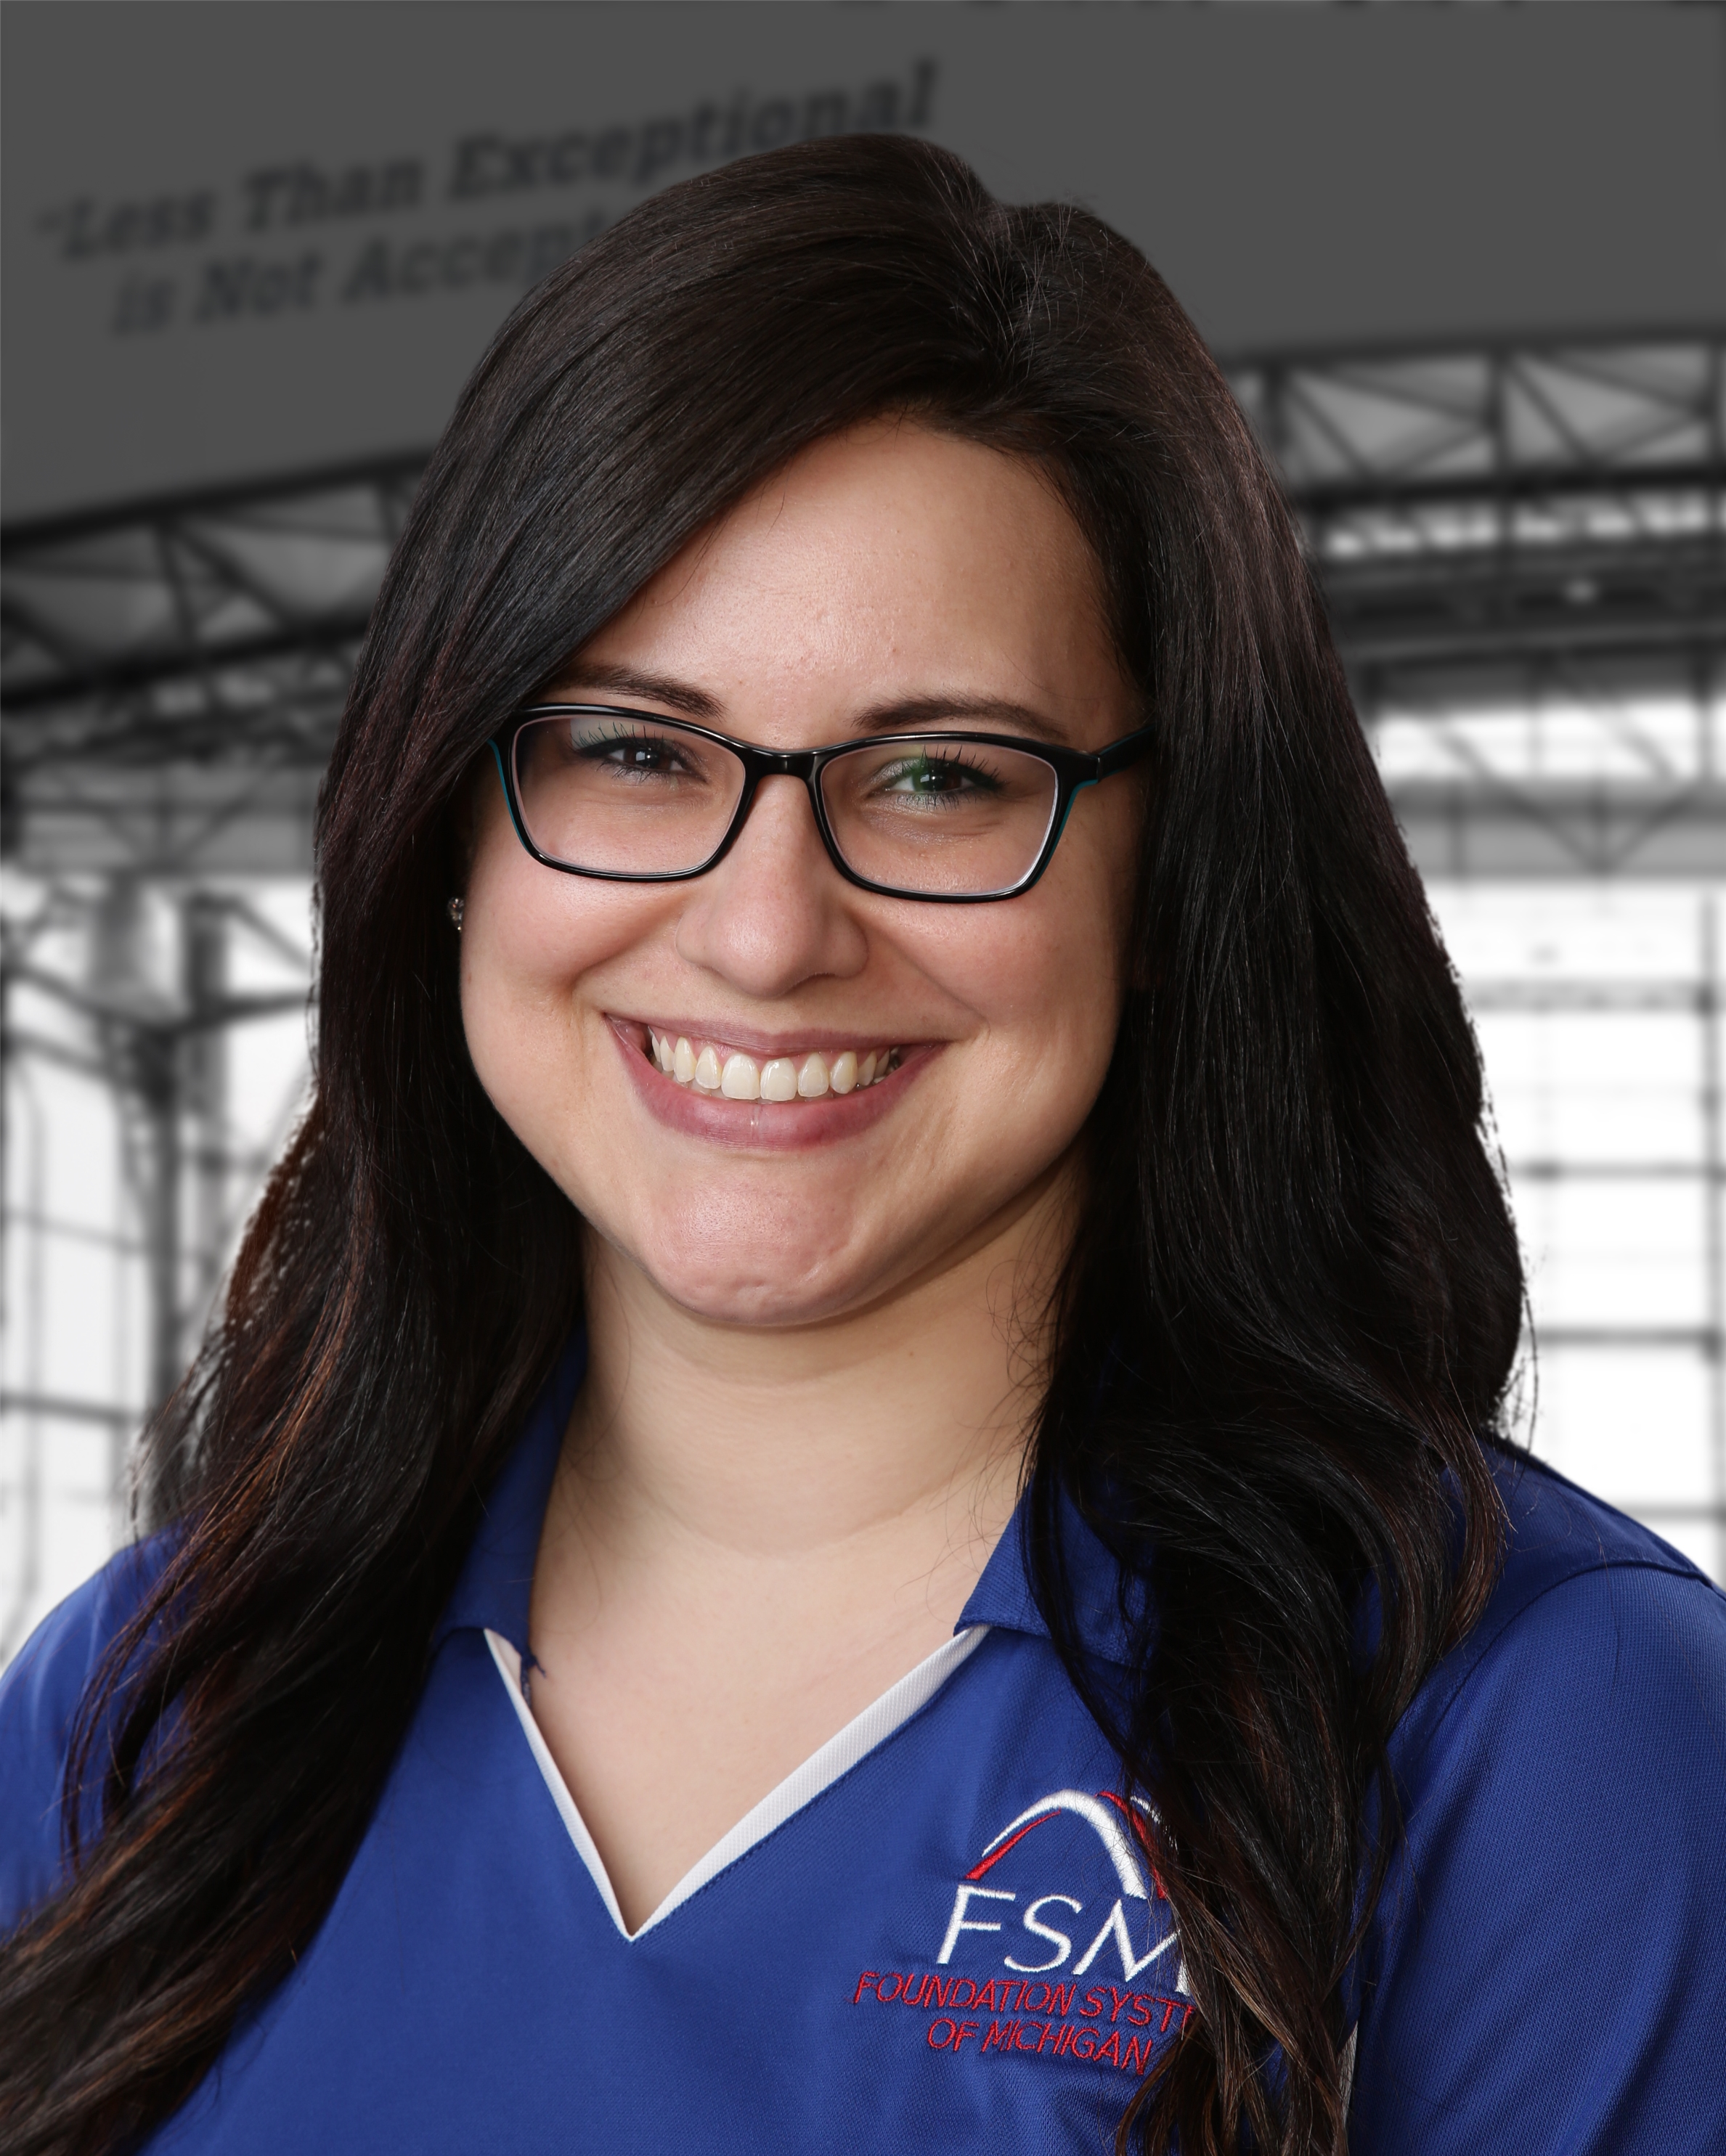 FSM Trisha Olson Customer Experience Advocate